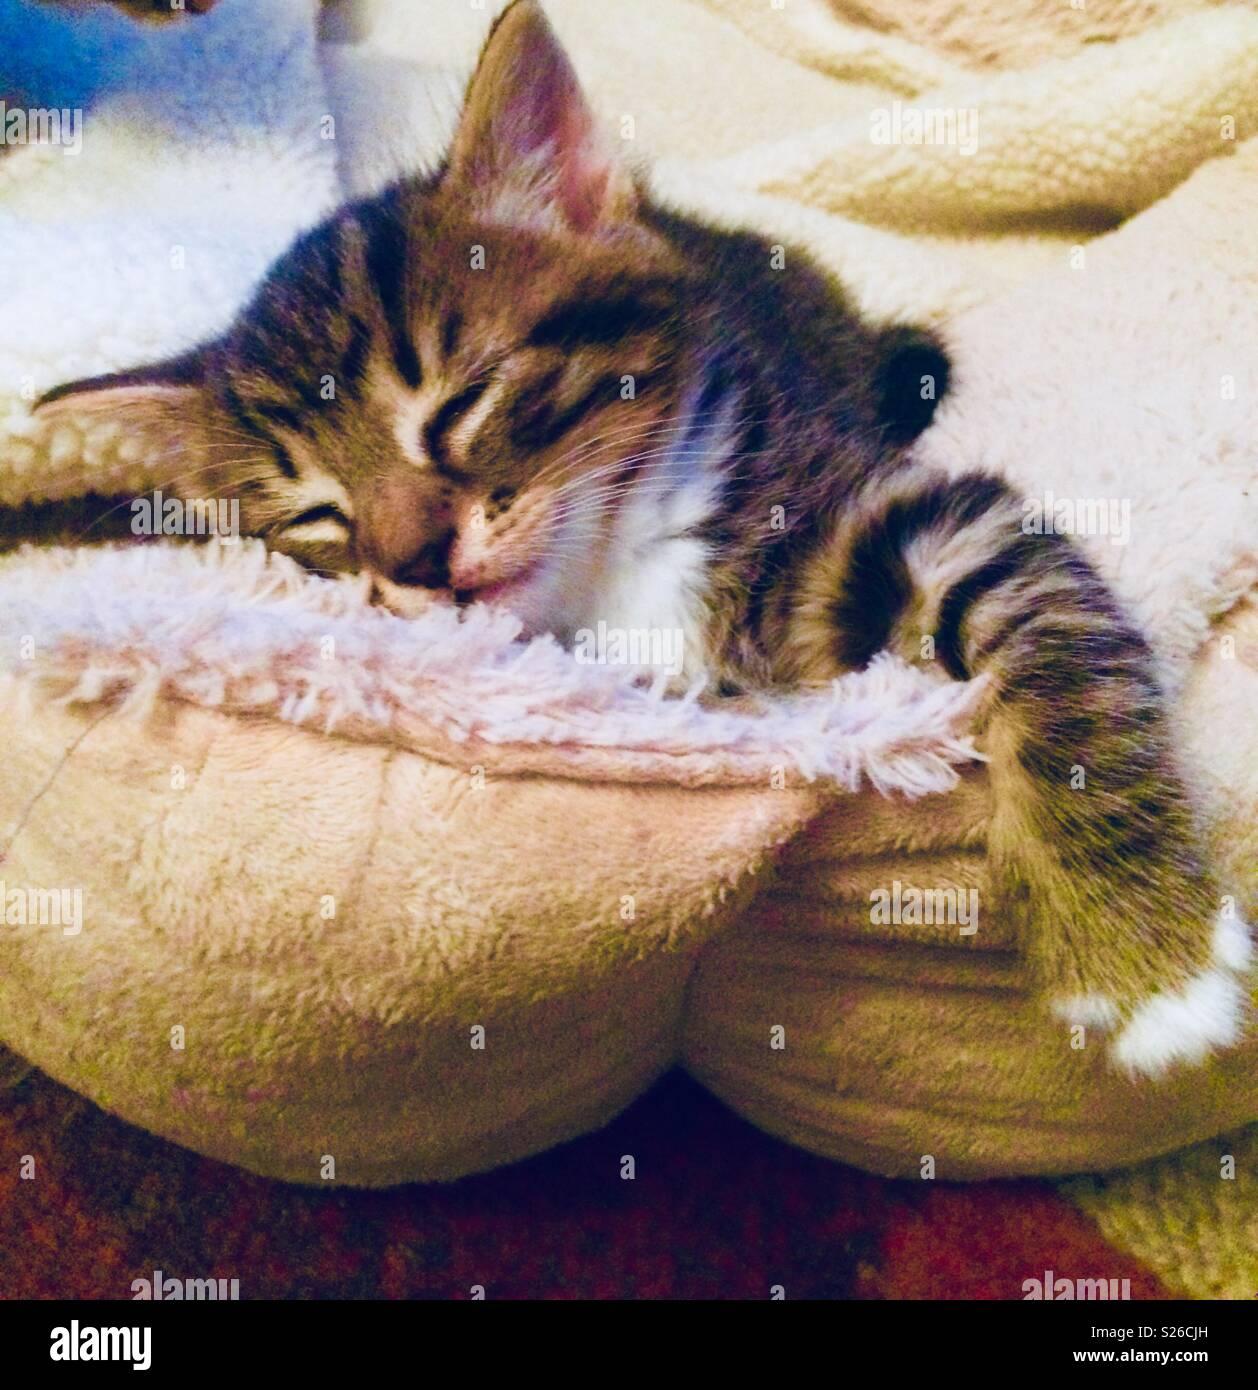 Tabby kitten sleeping in dogs bed - Stock Image